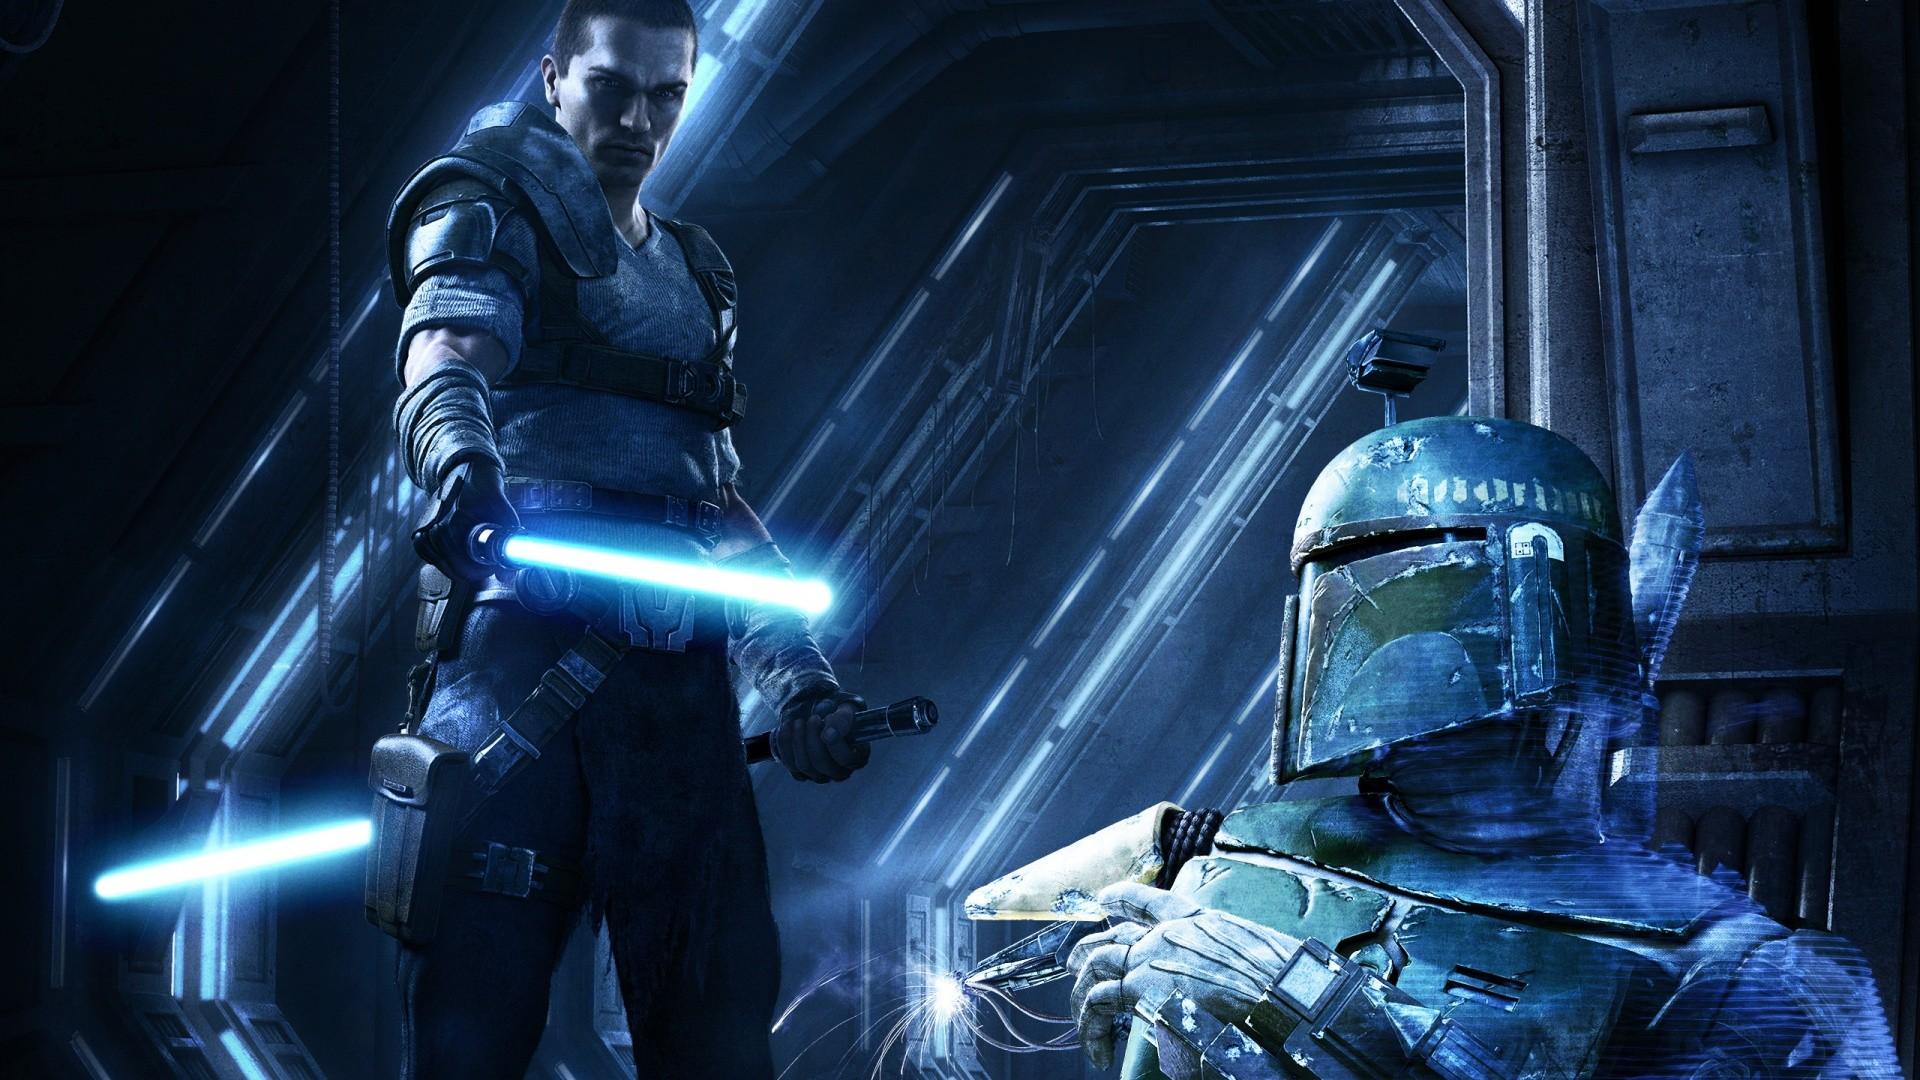 Star Wars: Force Unleashed 2 desktop PC and Mac wallpaper